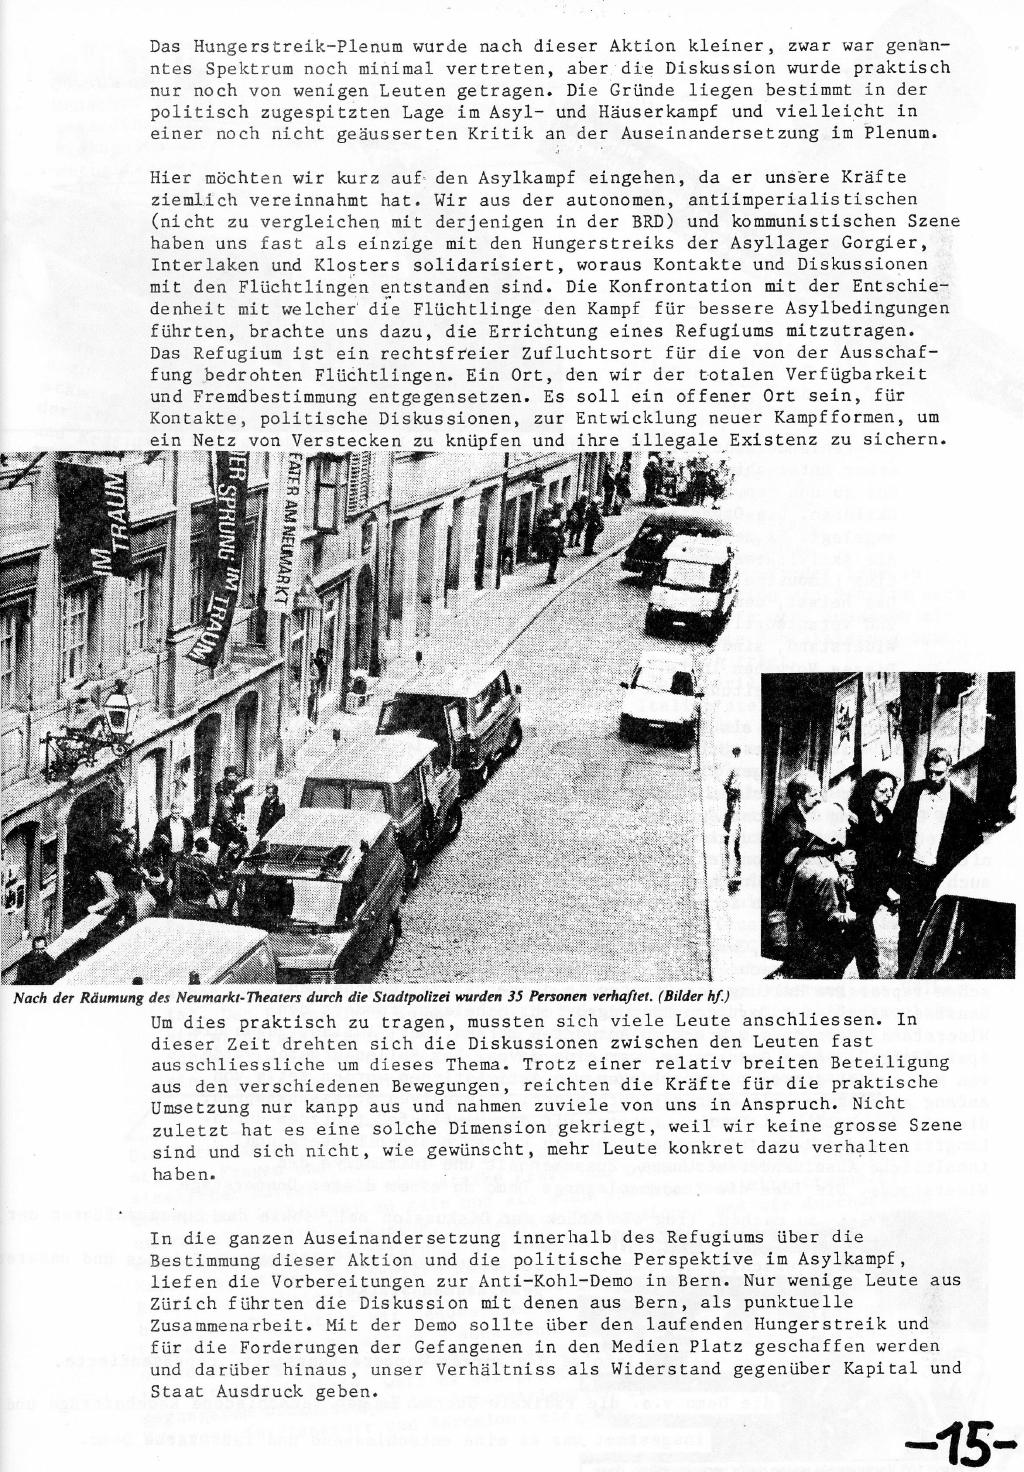 Belgien_Doku_Besetzung_EG_Kommission_1989_017